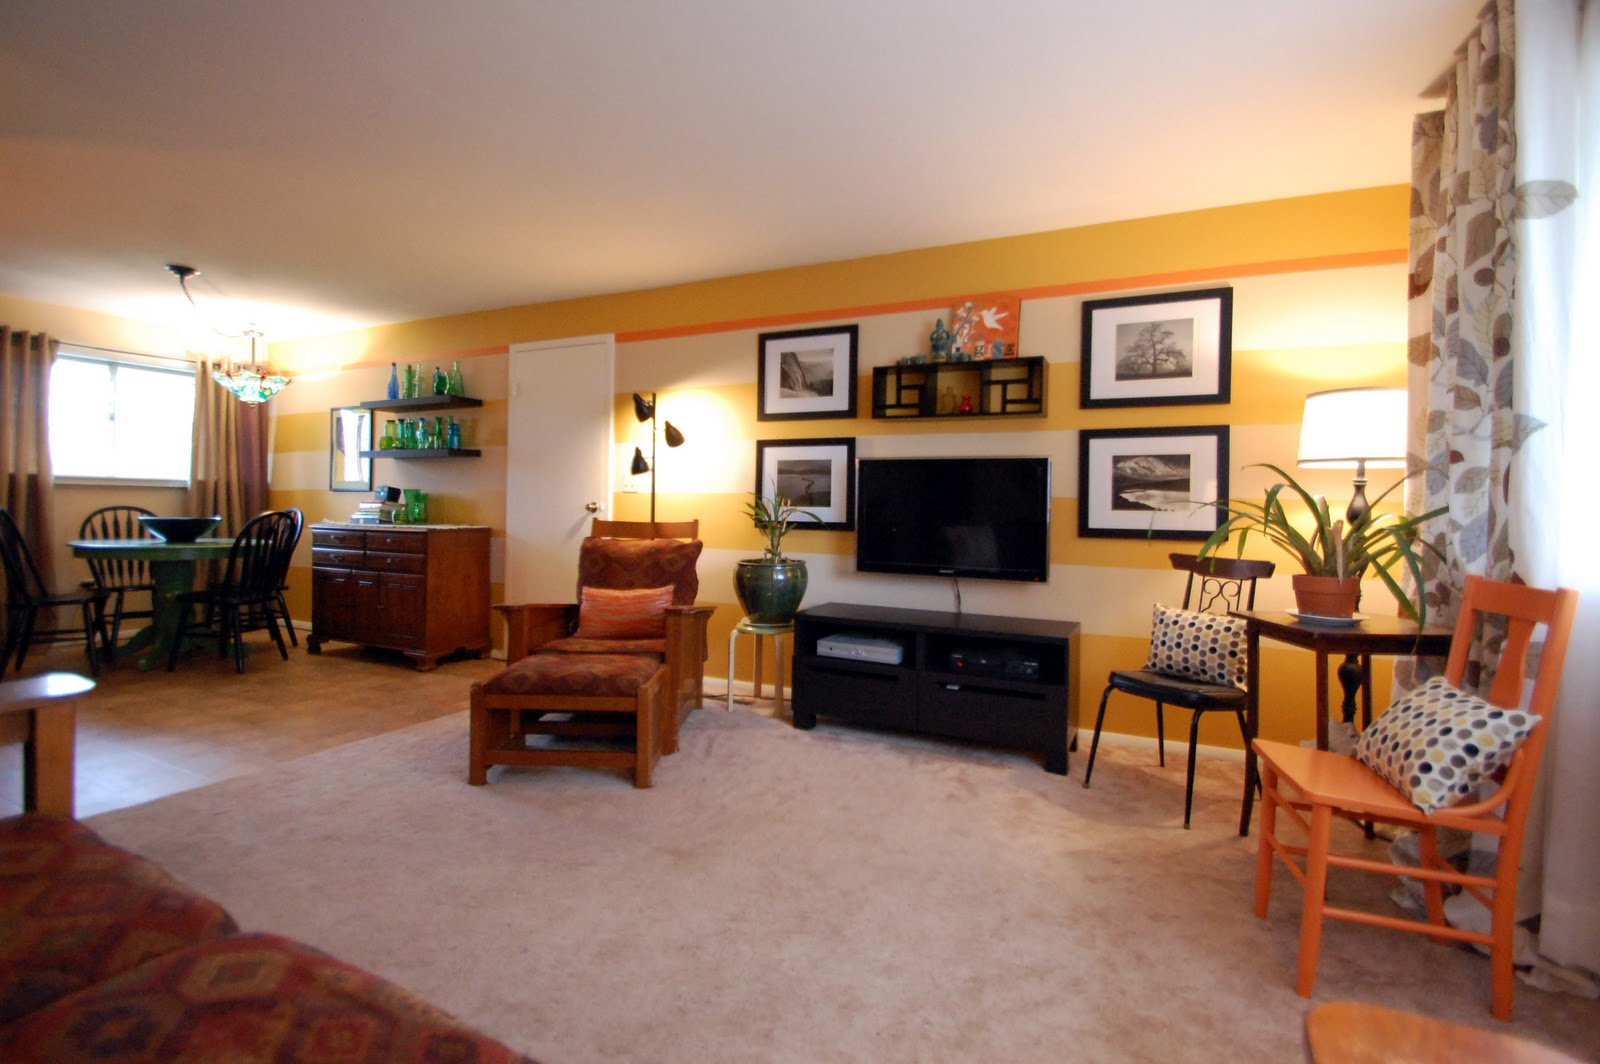 happyroost living room amp dining room makeover revealed living room living room makeover ideas design living